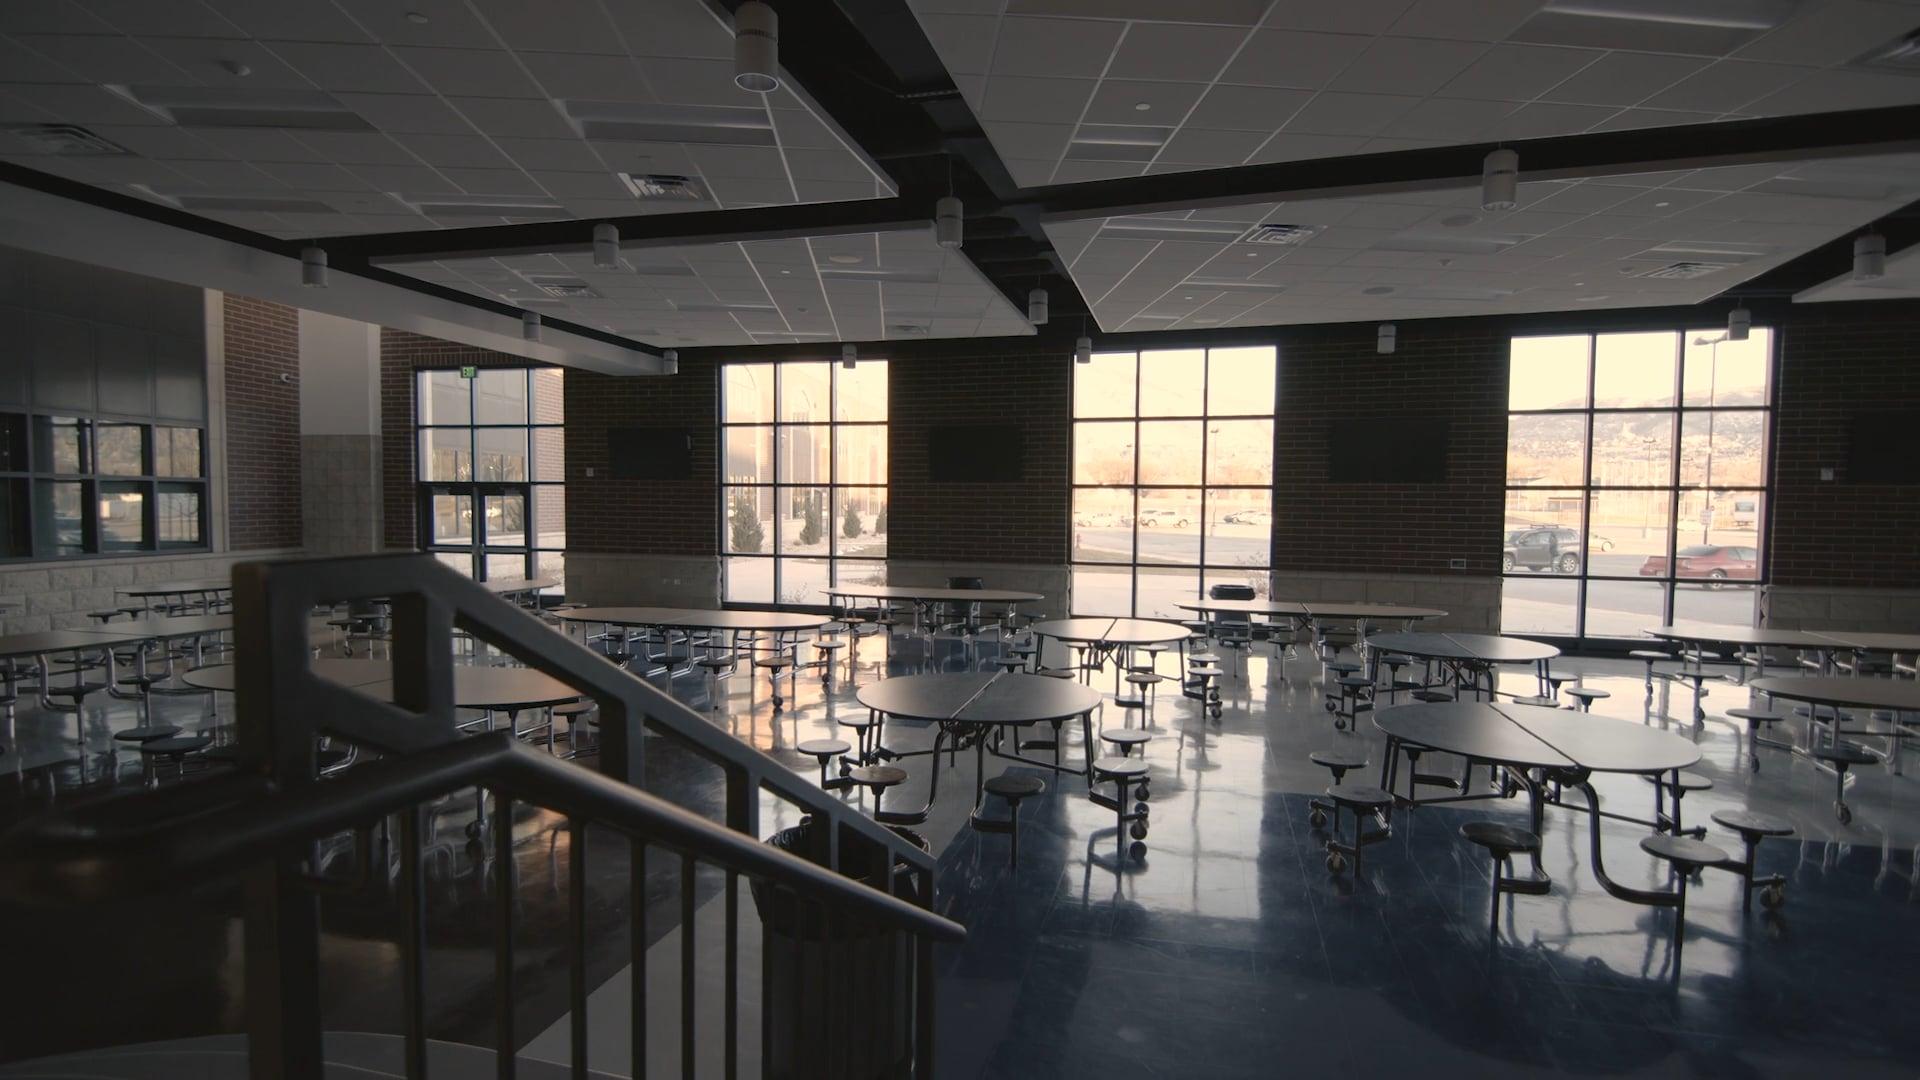 Utah HERO Project: Teachers